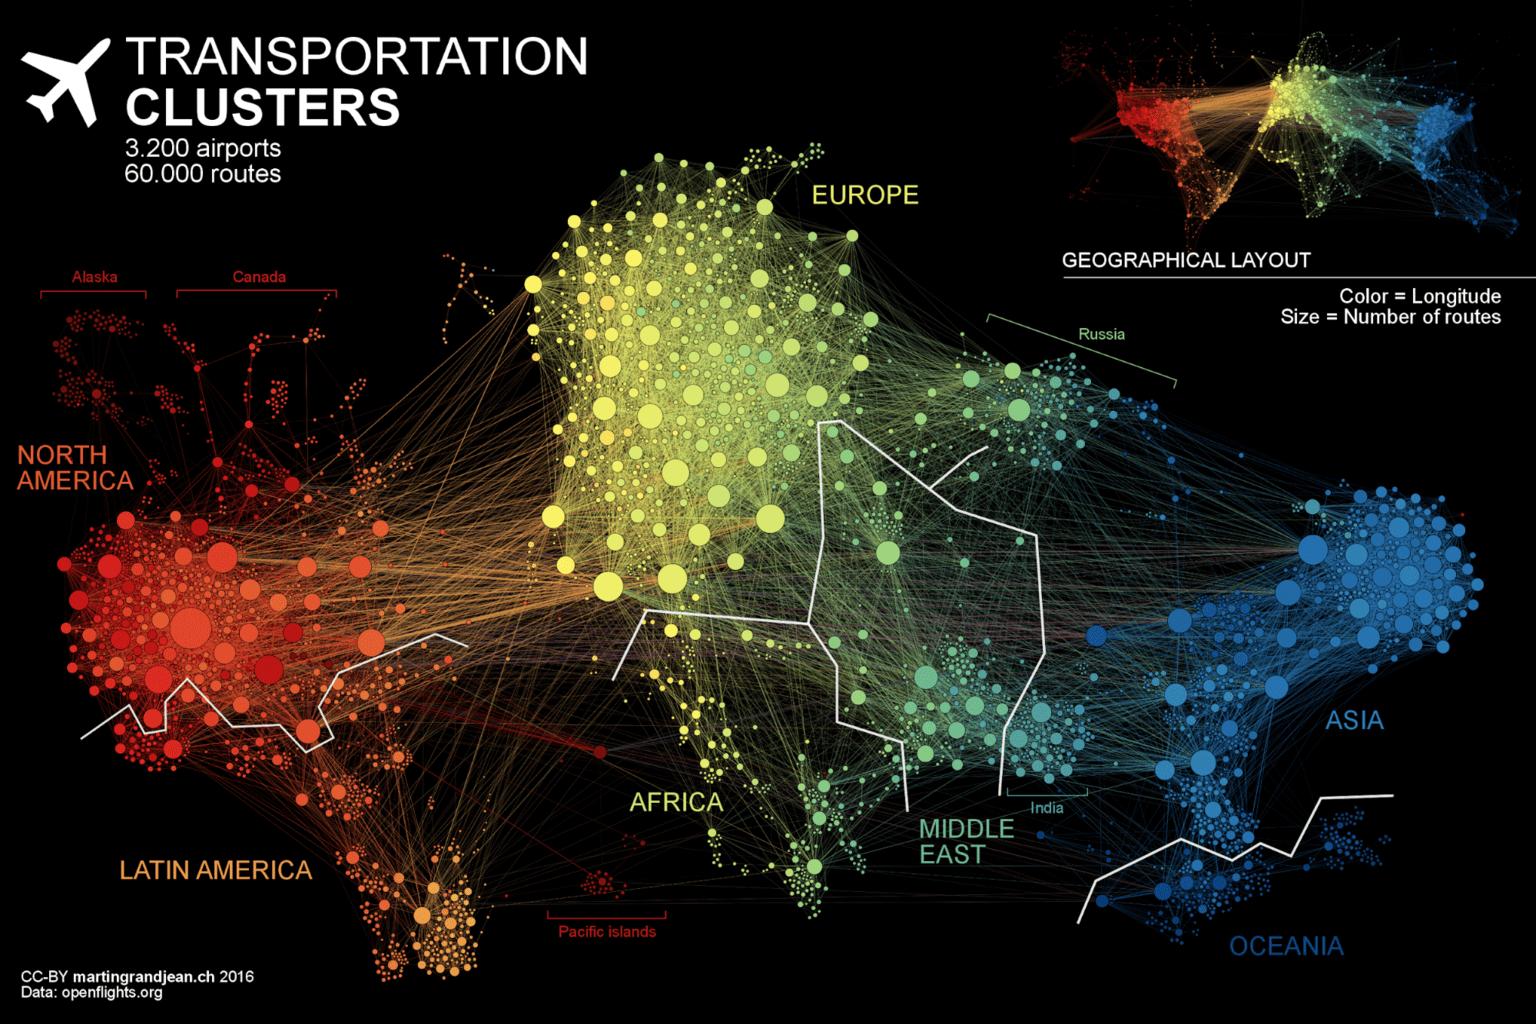 Transportation clusters